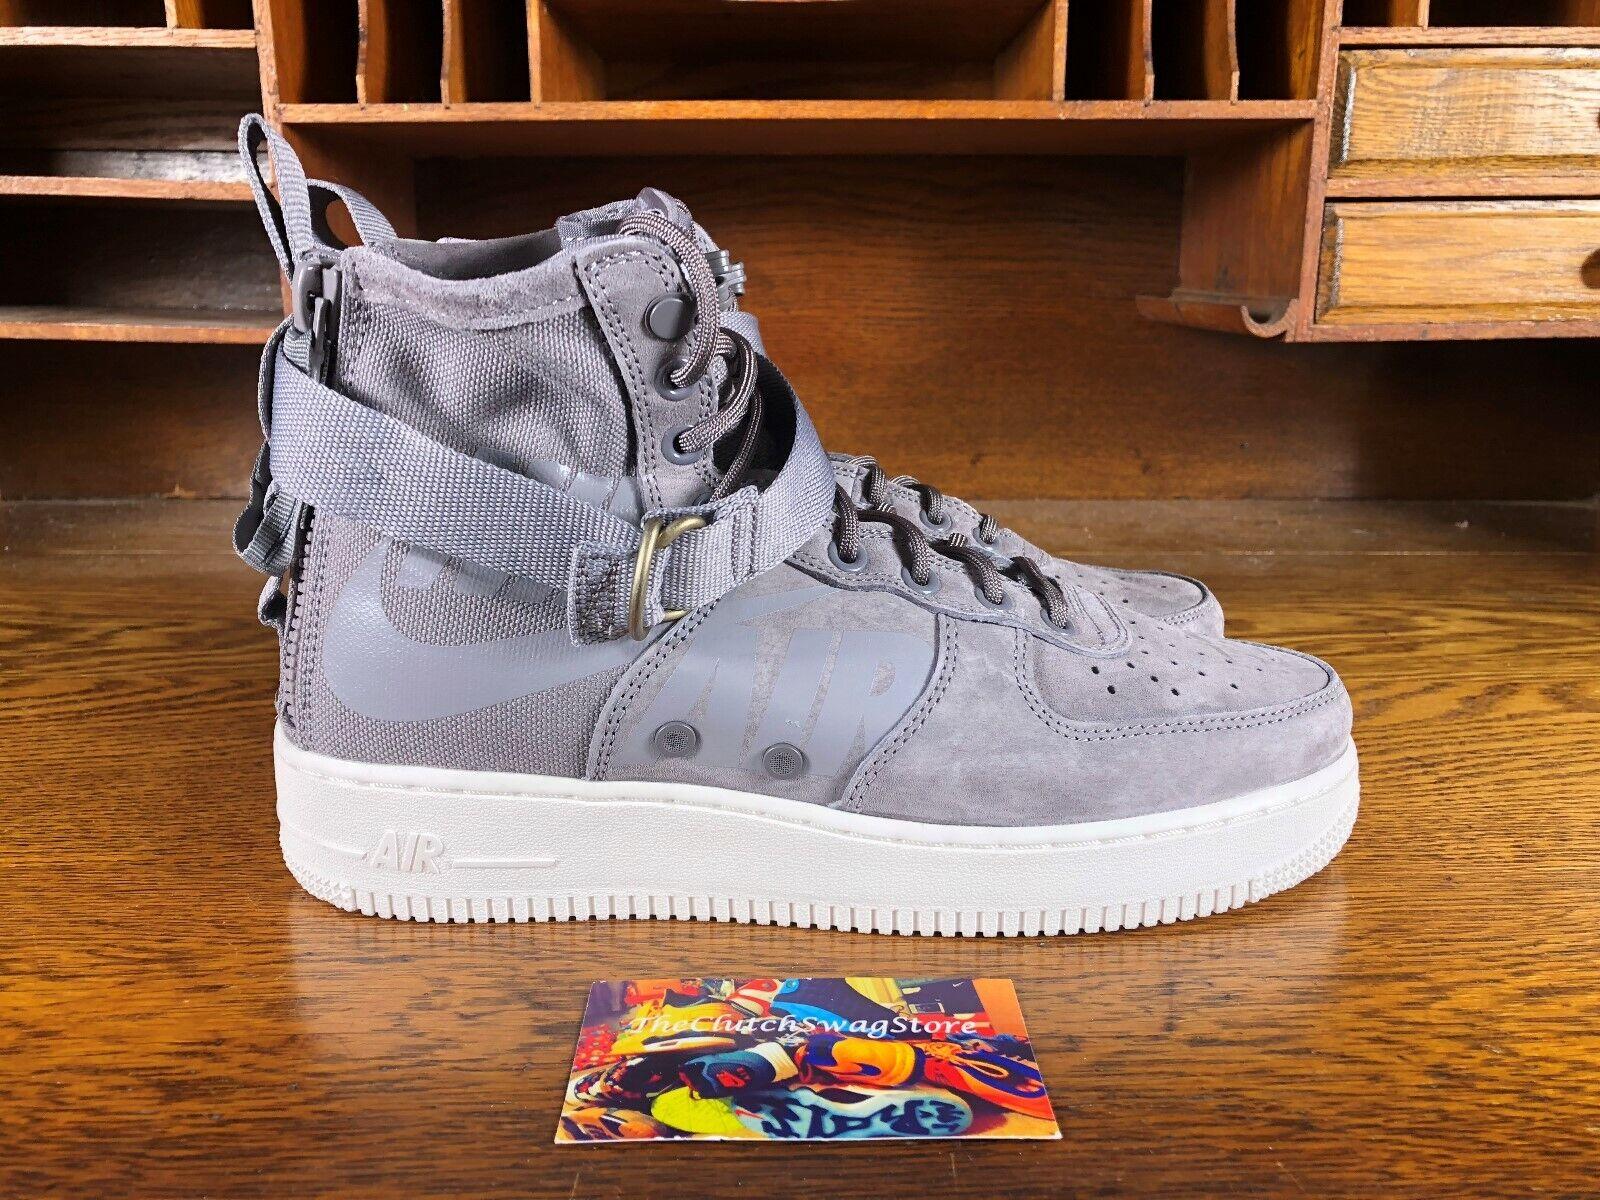 Nike SF-AF1 Mid Mens Mens Mens High Top shoes Gunsmoke Wolf Grey 91775-007 NEW Size 12 45f289